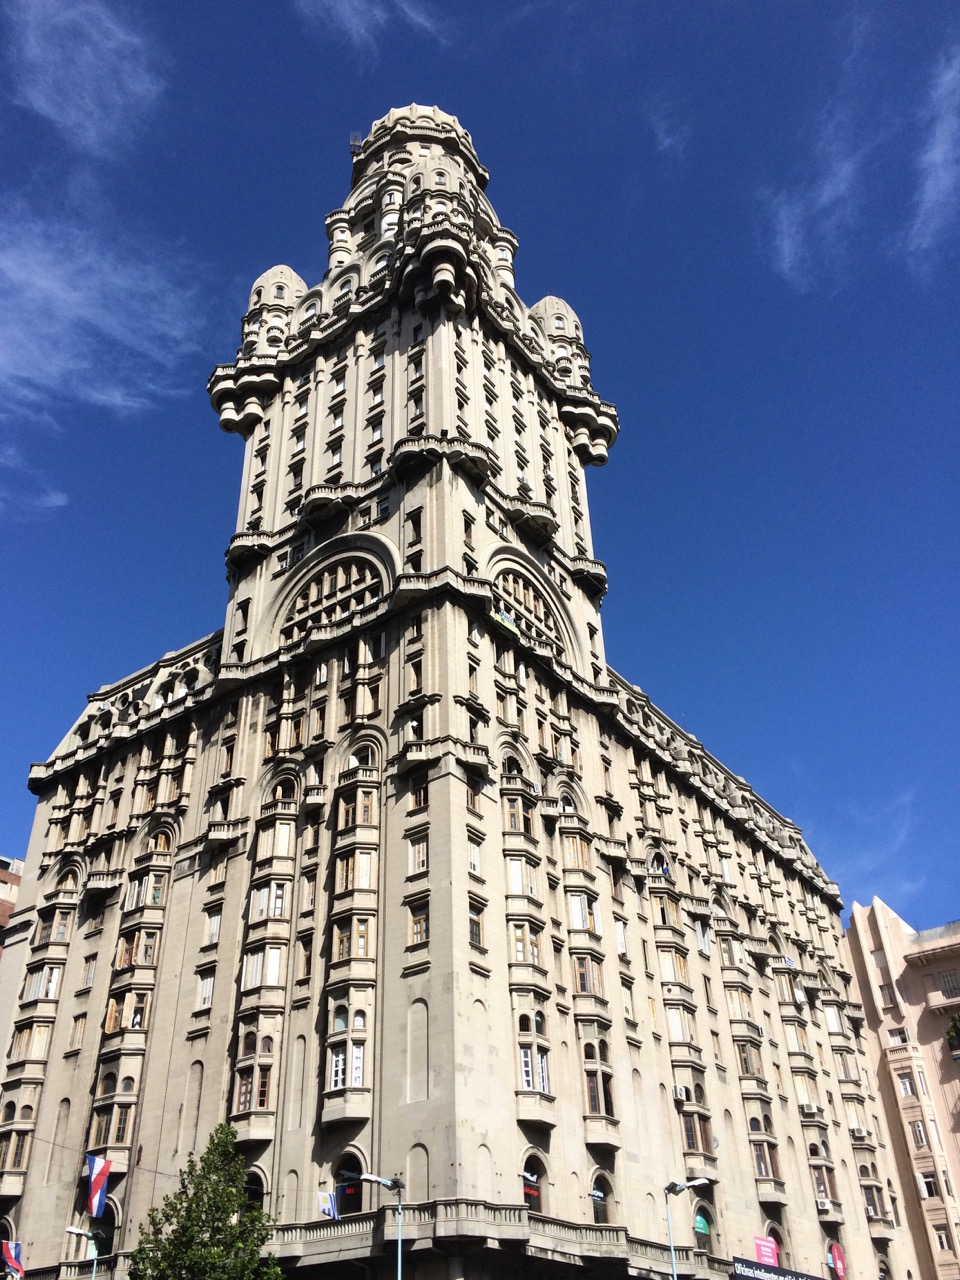 Palacio Salvo, the most famous landmark of Montevideo